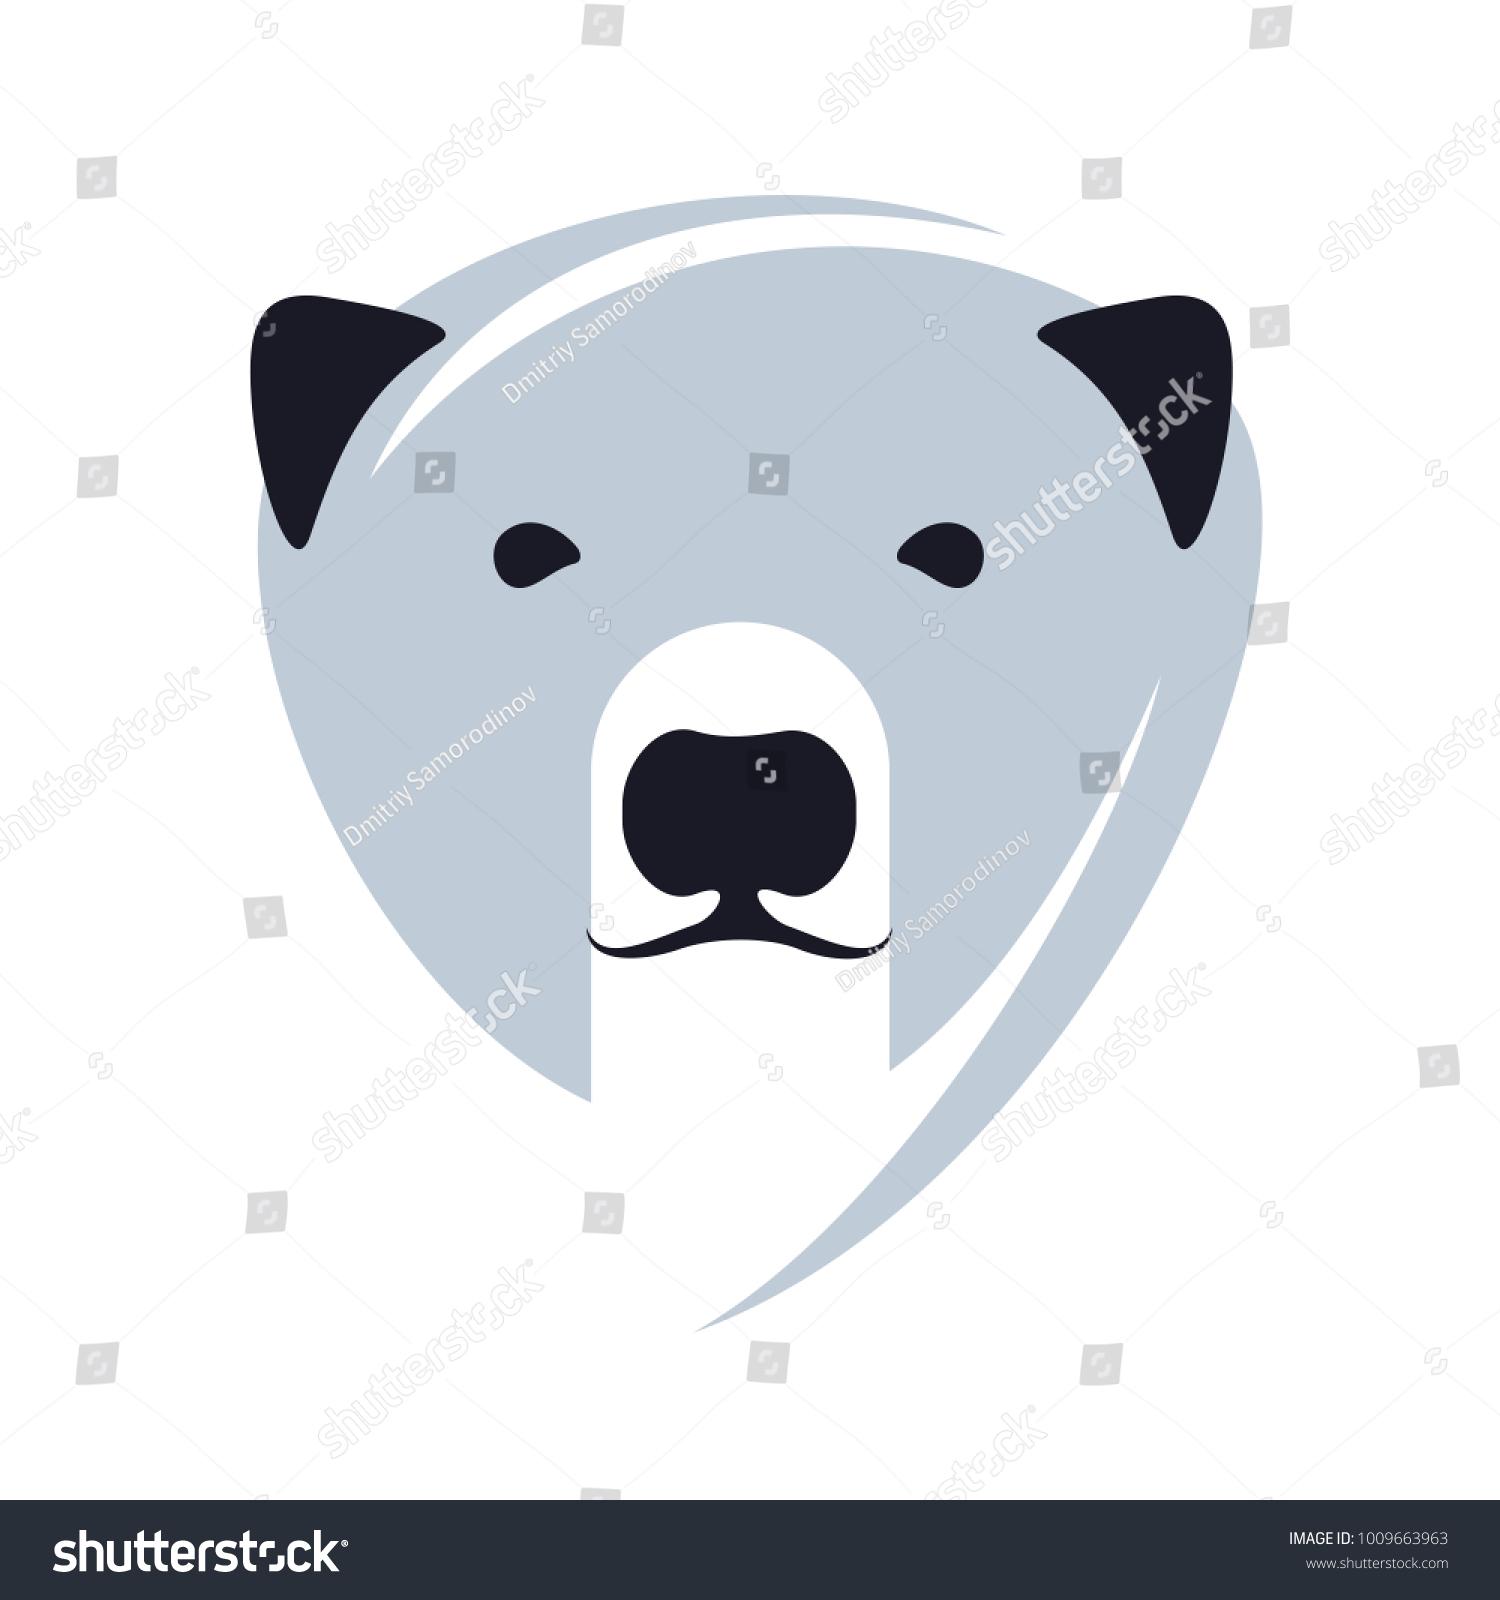 Stylized graphic polar bear logo templates stock illustration stylized graphic polar bear logo templates collection of creative polar bear logotype templates growth maxwellsz